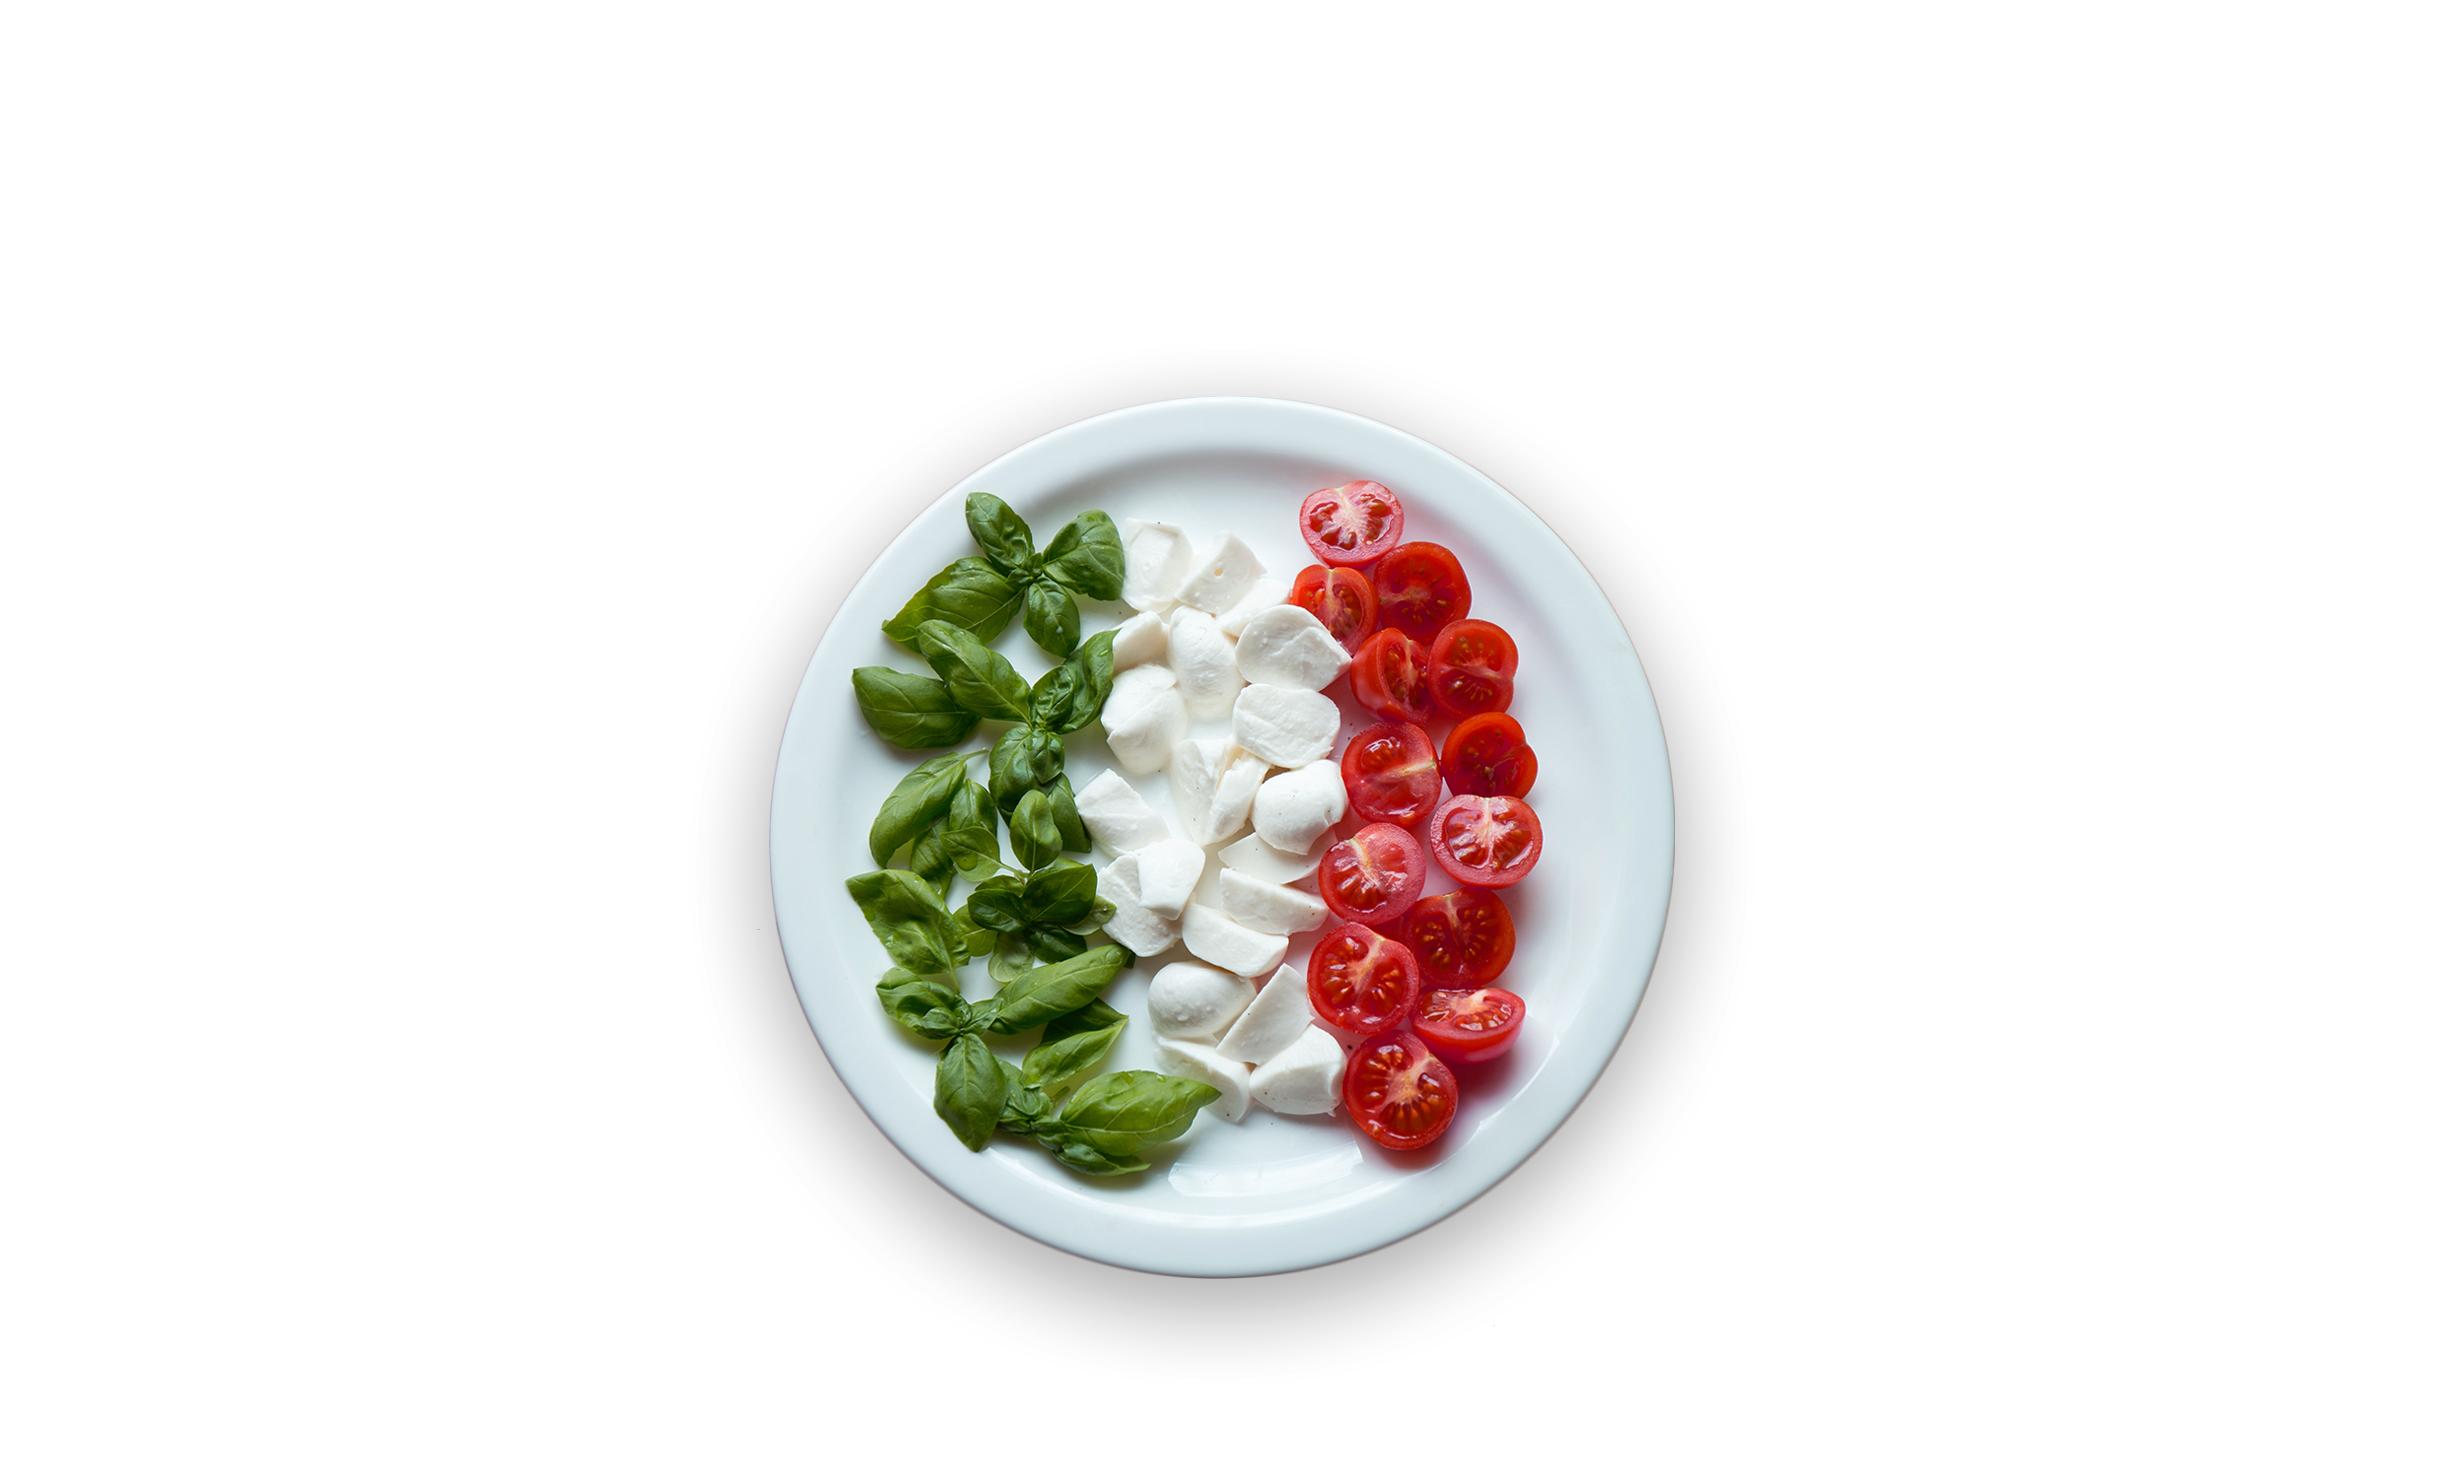 Italian food Archives - Italian Good News